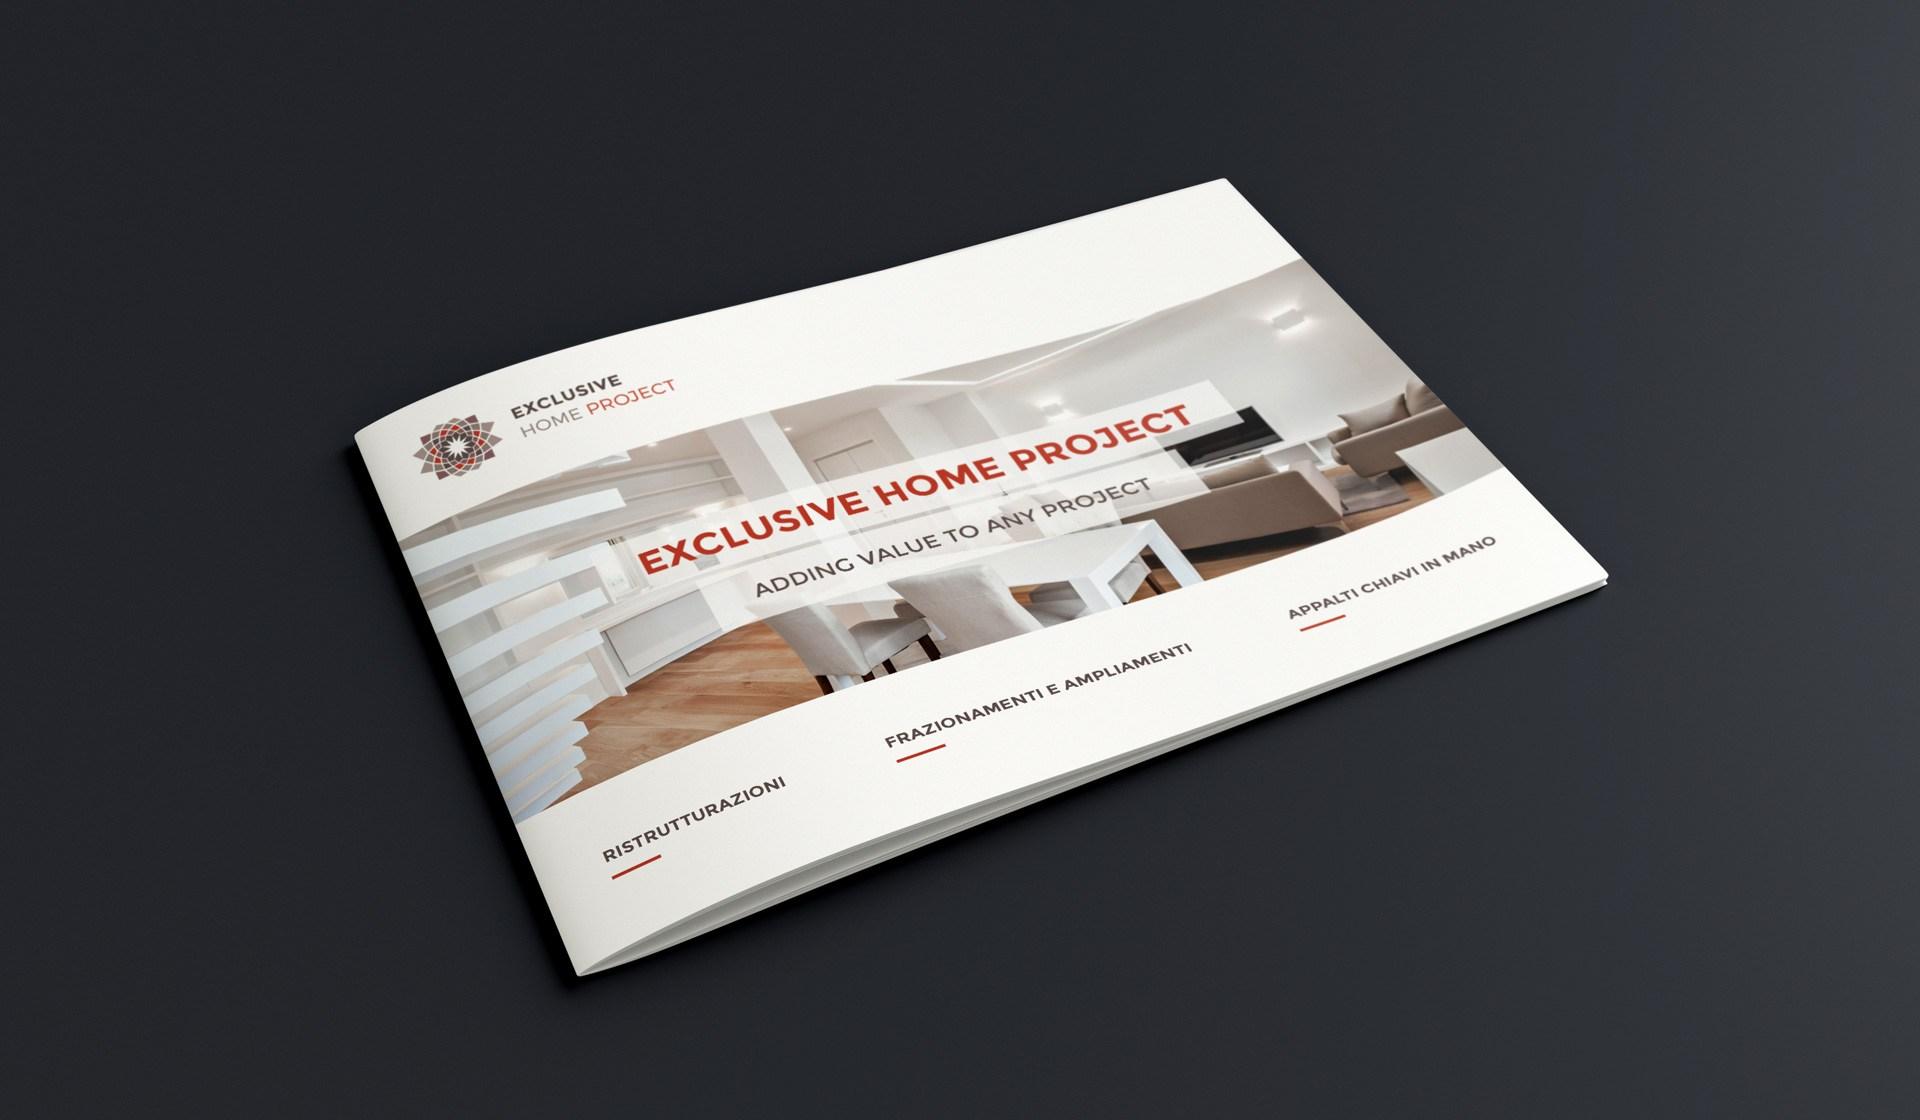 exclusive-home-project-brochure-scriptaimago